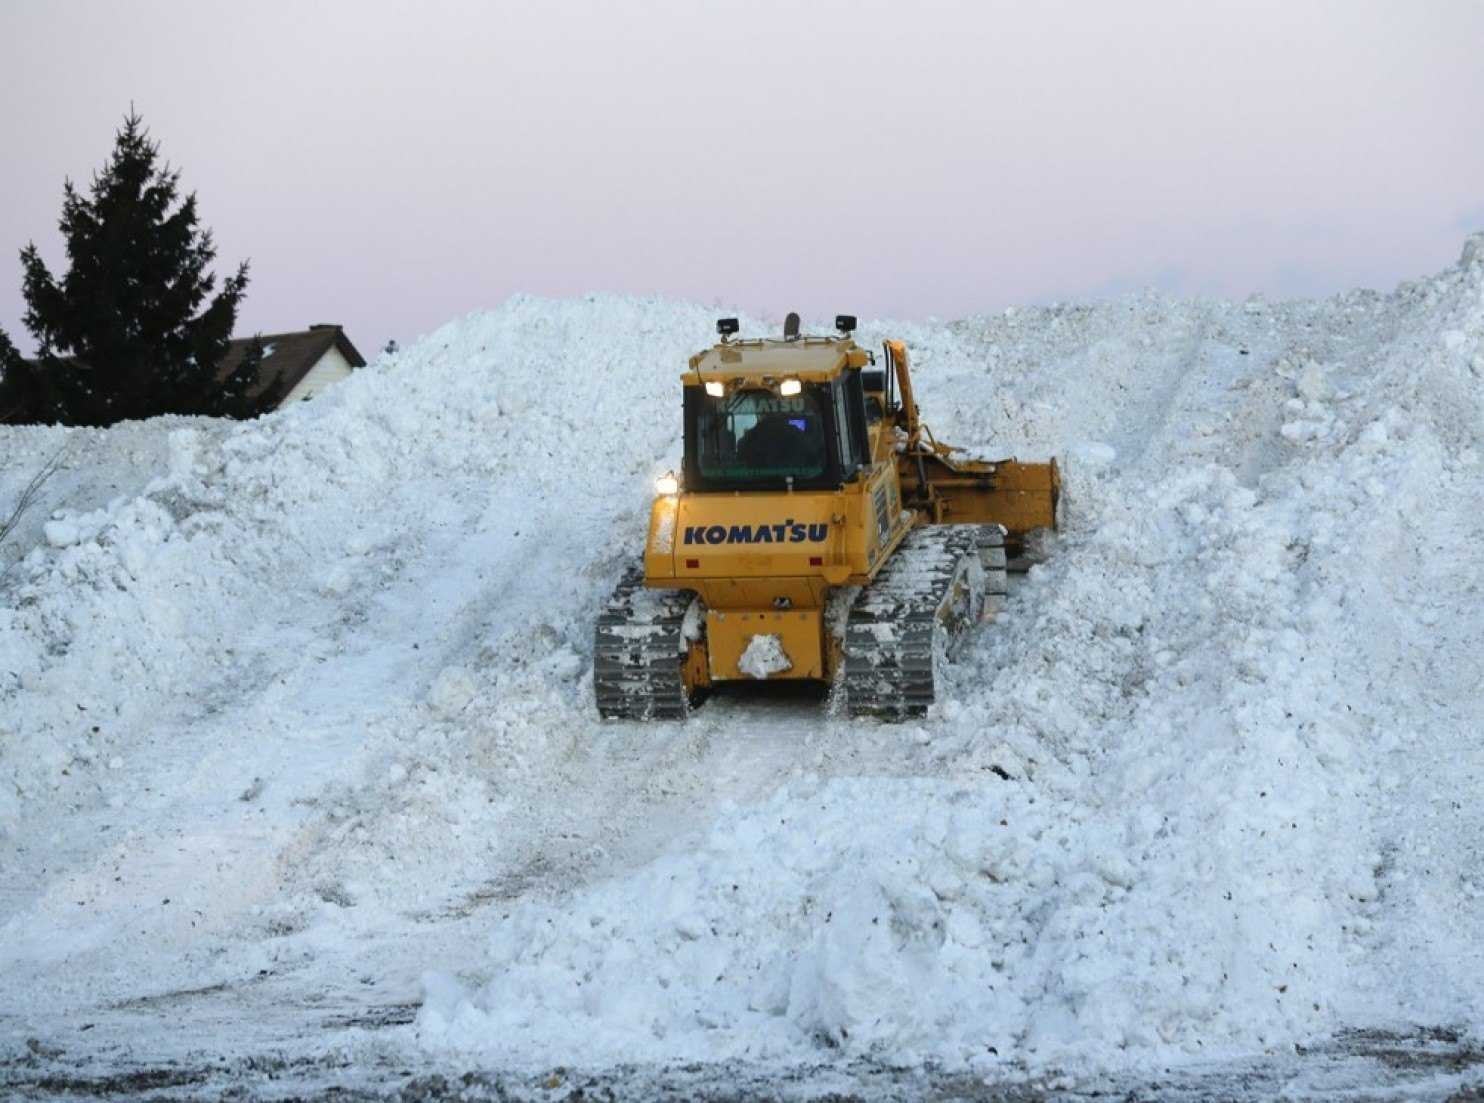 Bulldozer attempts to clear snow in Buffalo, NY.